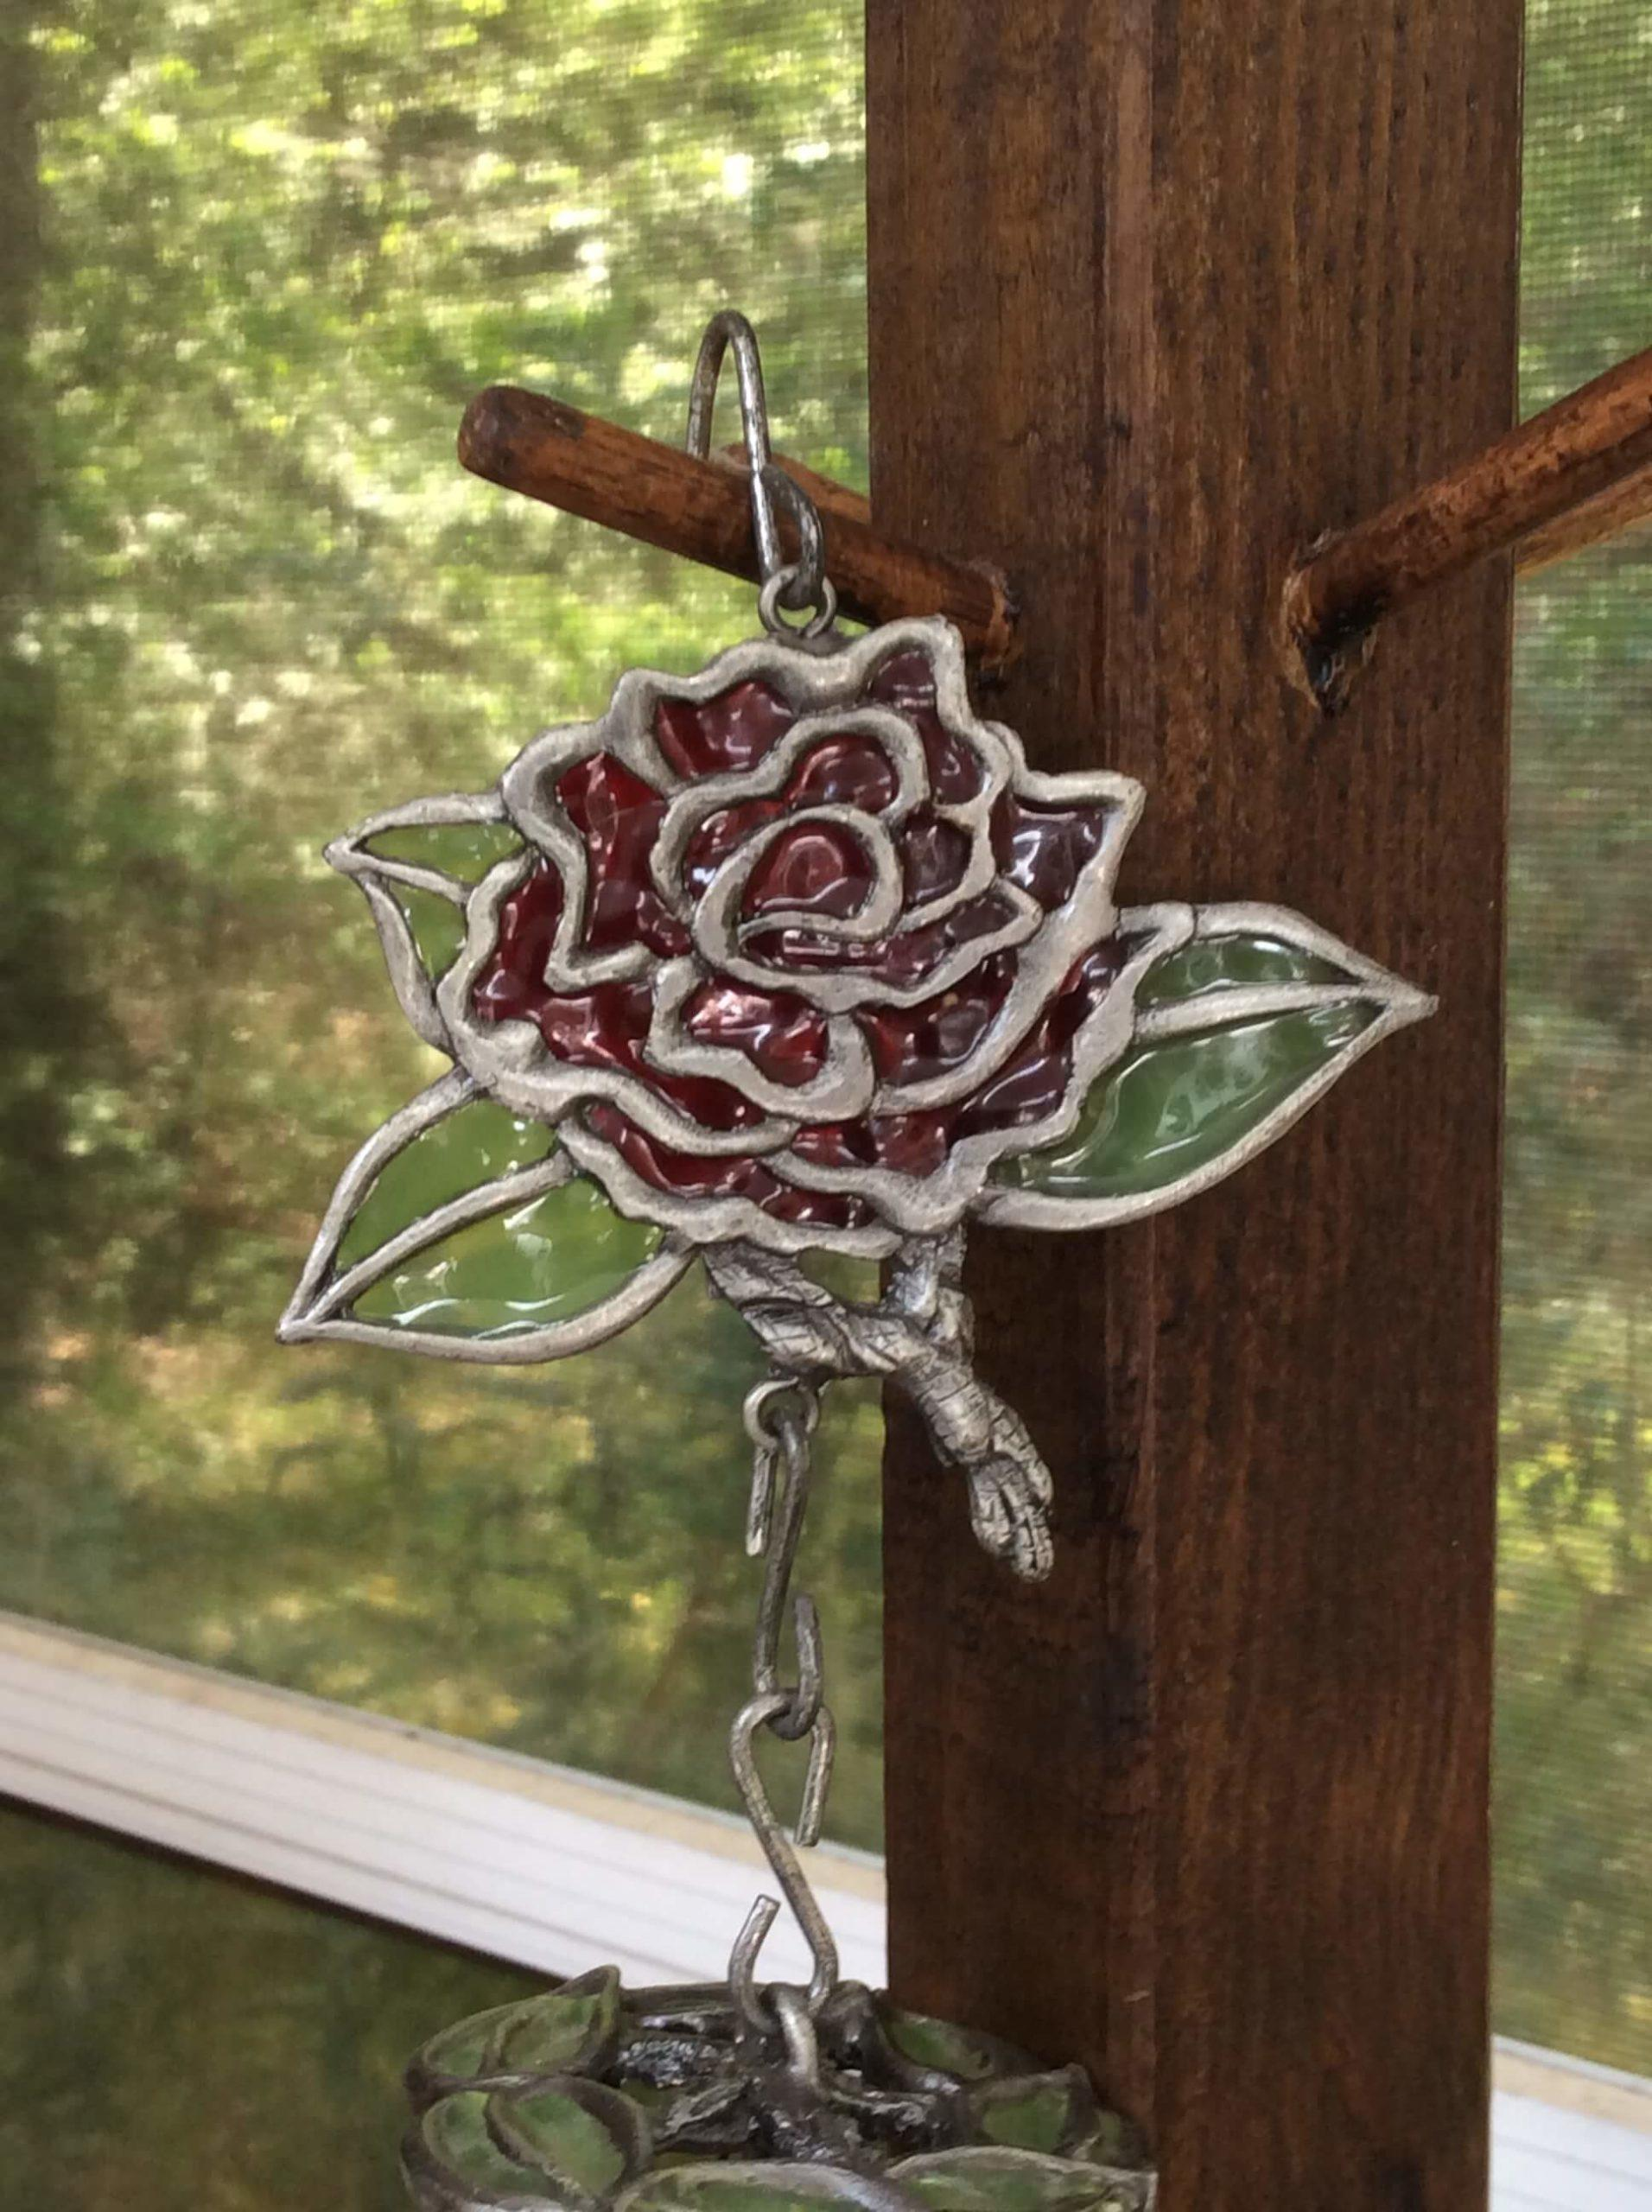 Loving Rose chime close-up